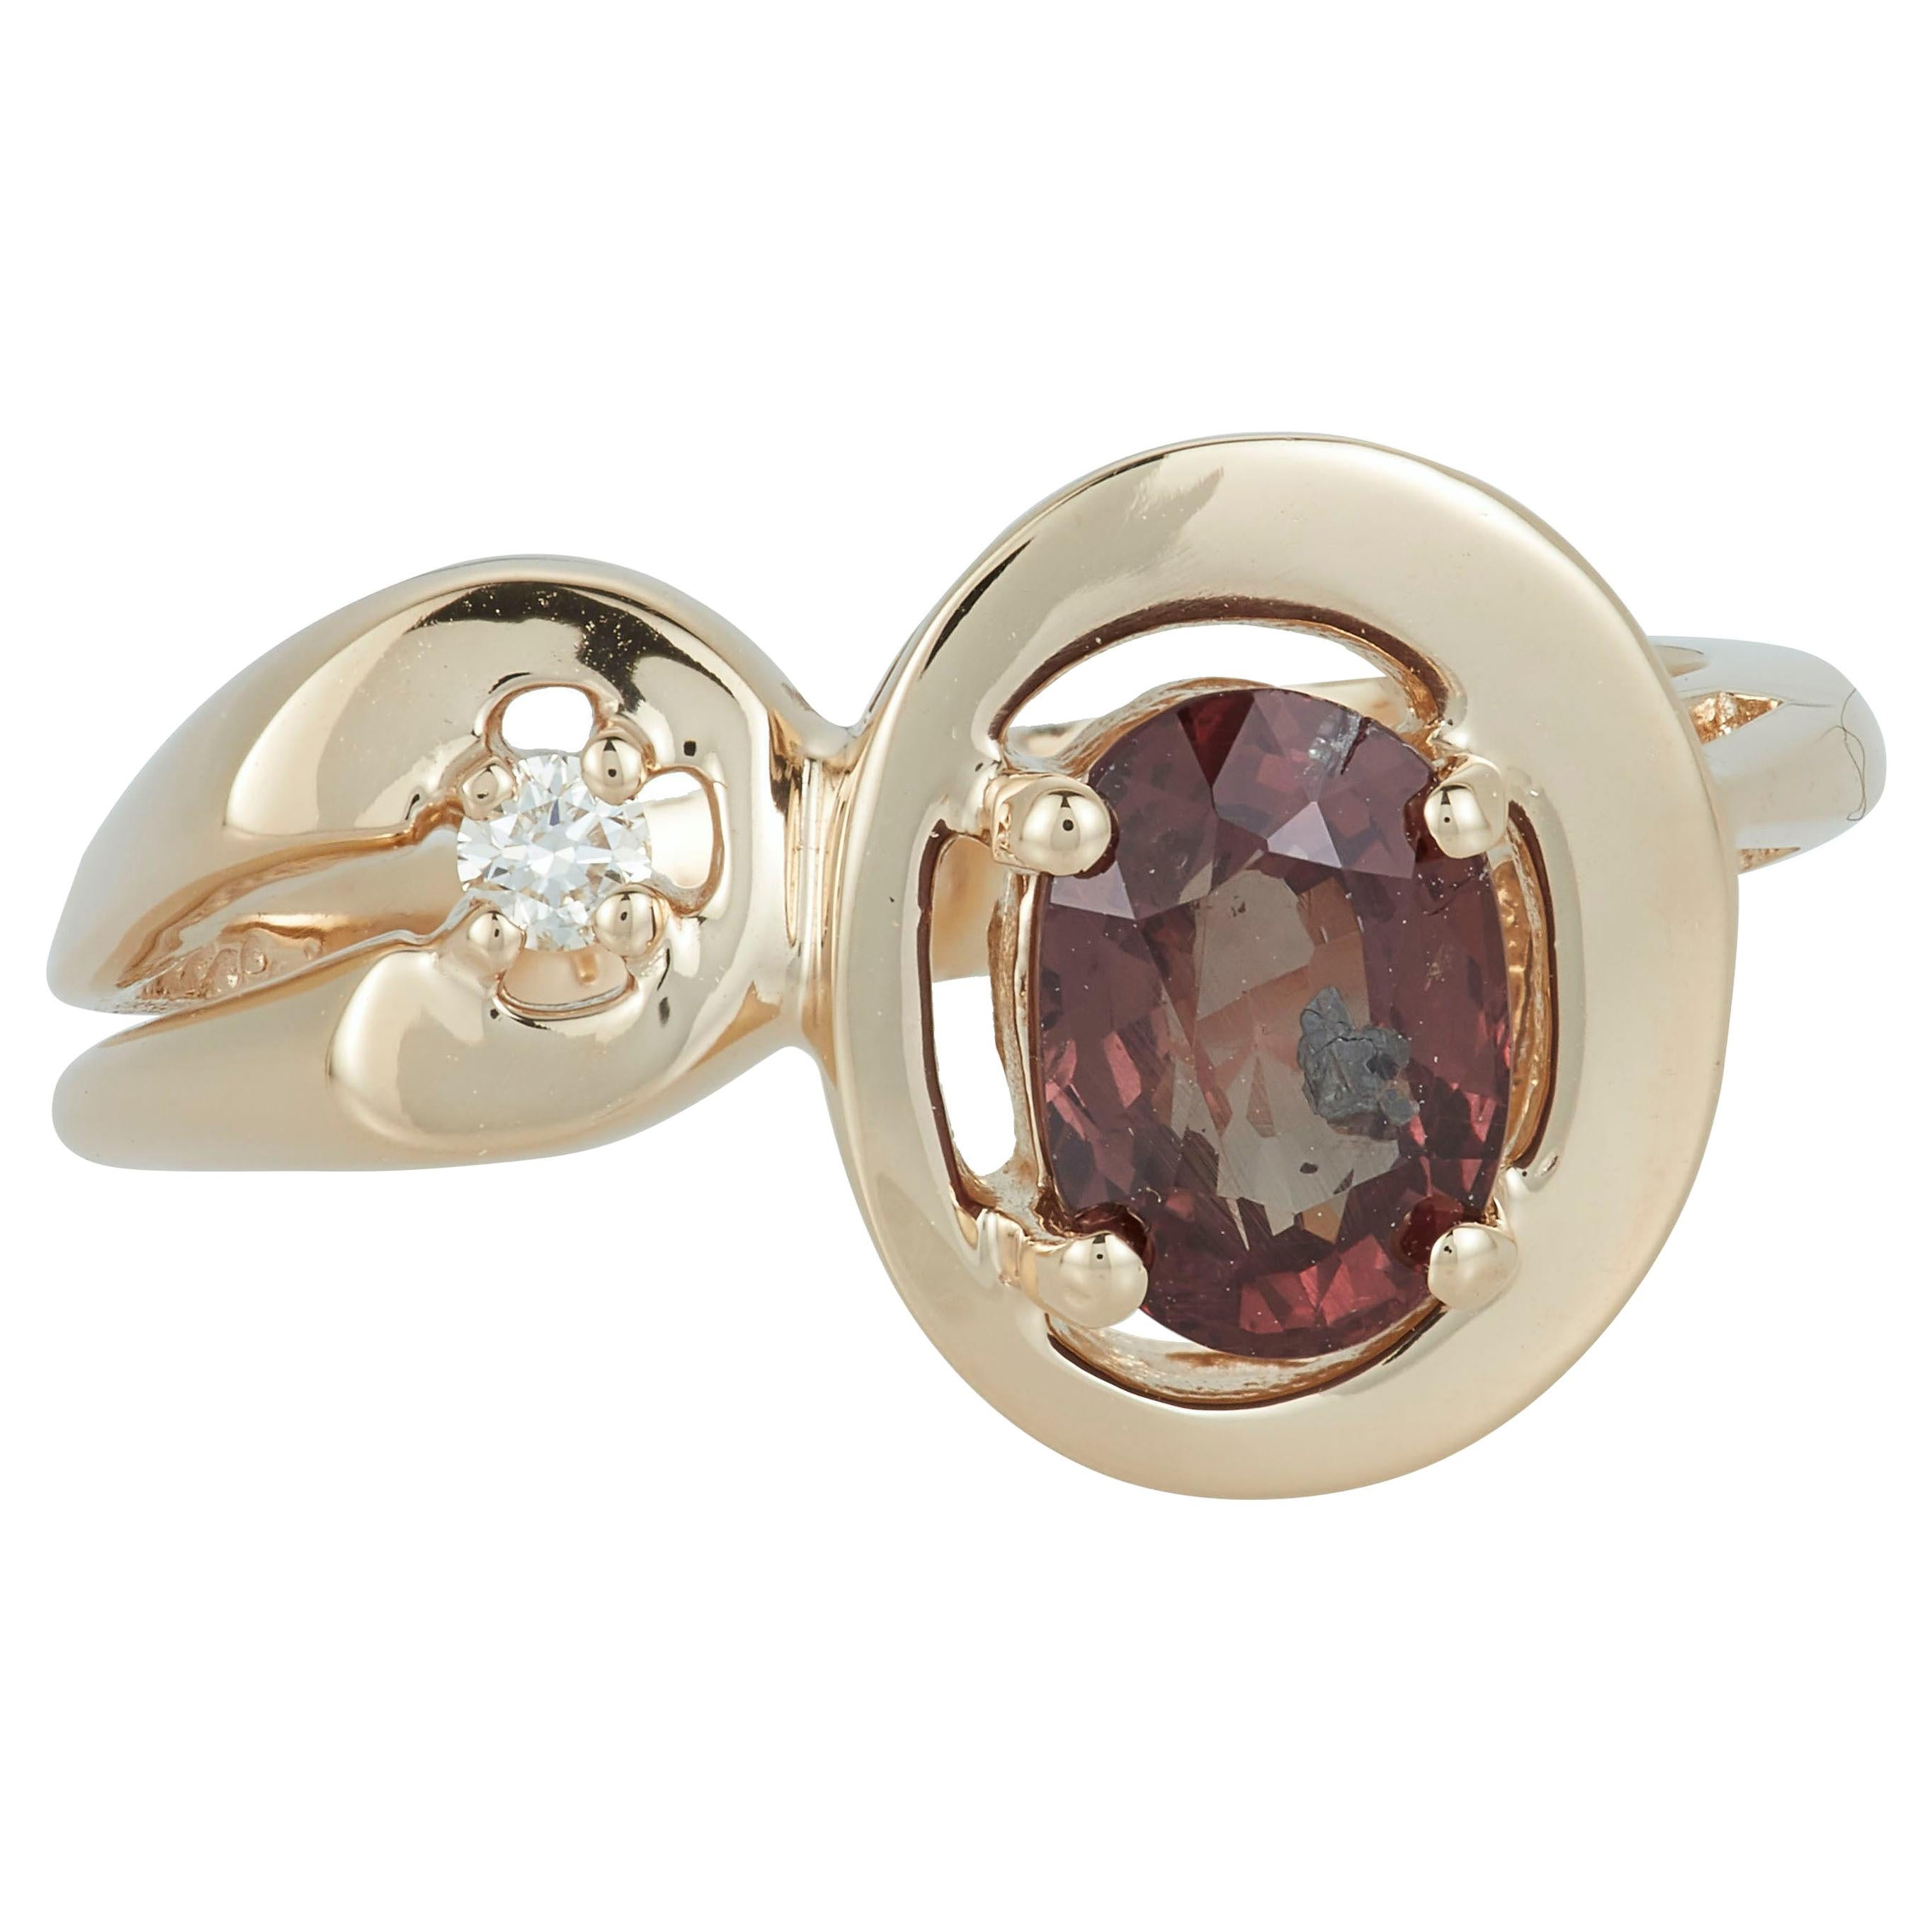 Natural Color Change Capella Star Diamond Fashion Toi et Moi Ring 14 Karat Gold